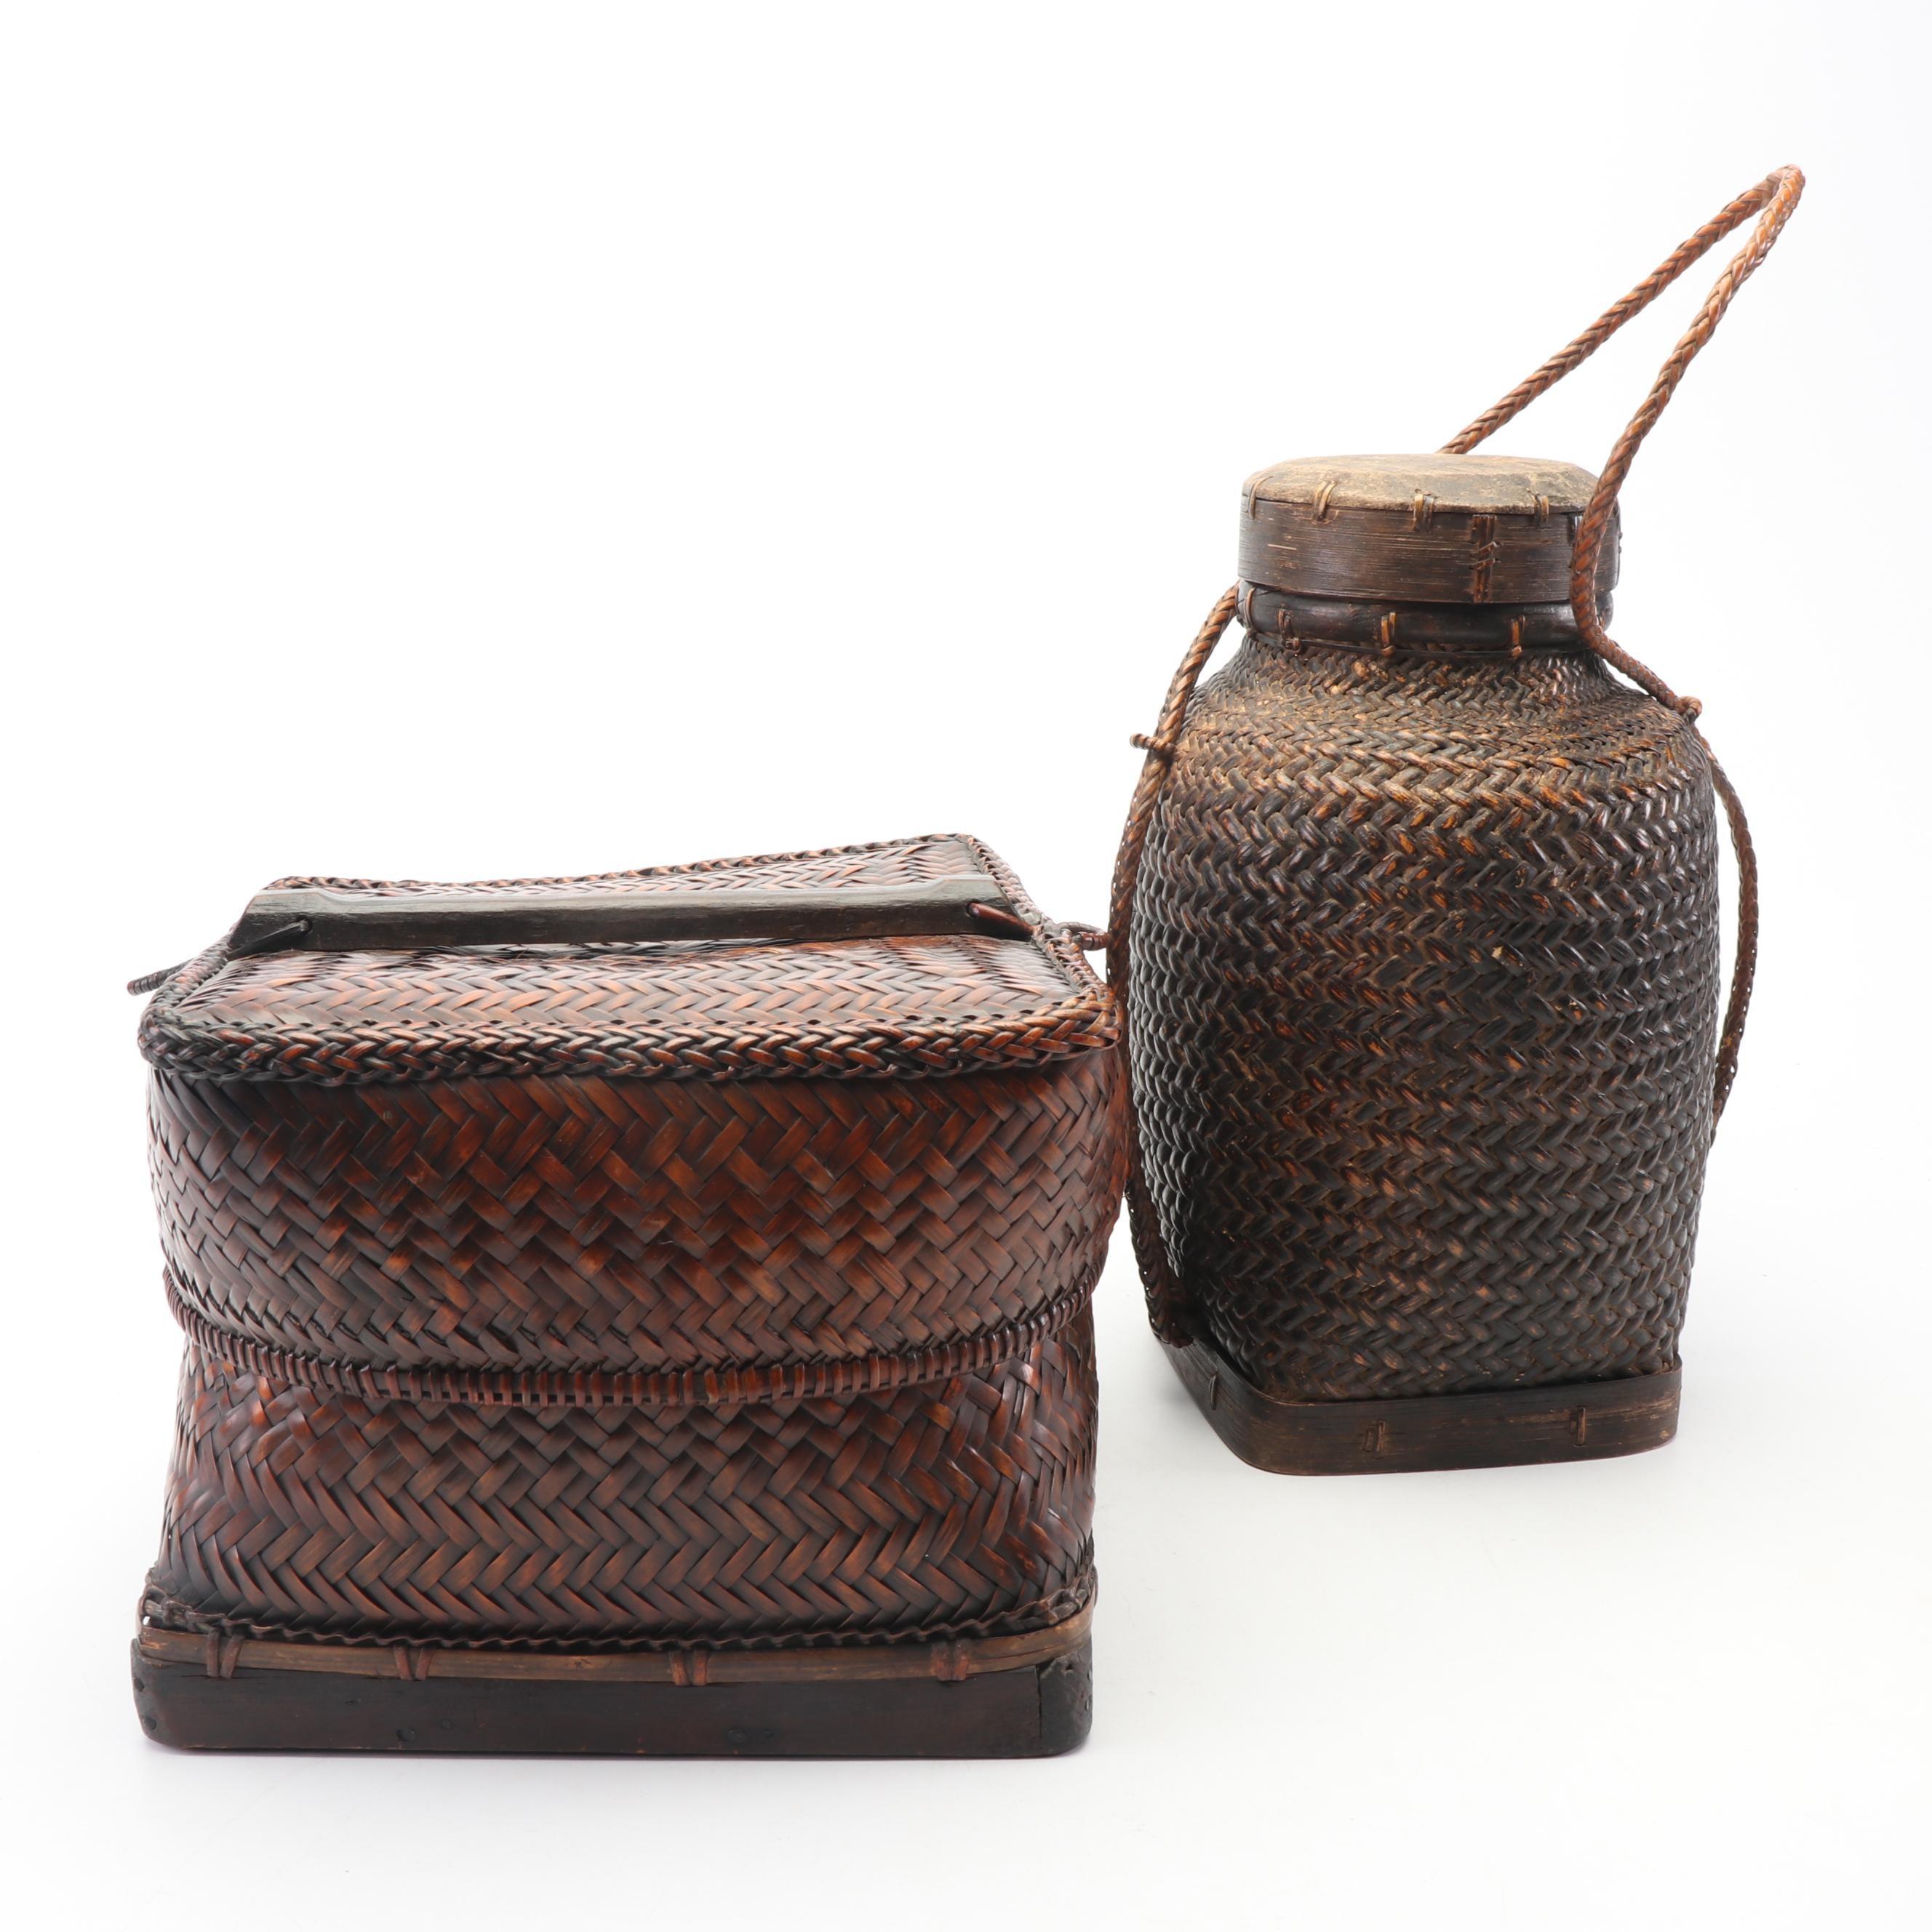 Japanese Bamboo Baskets